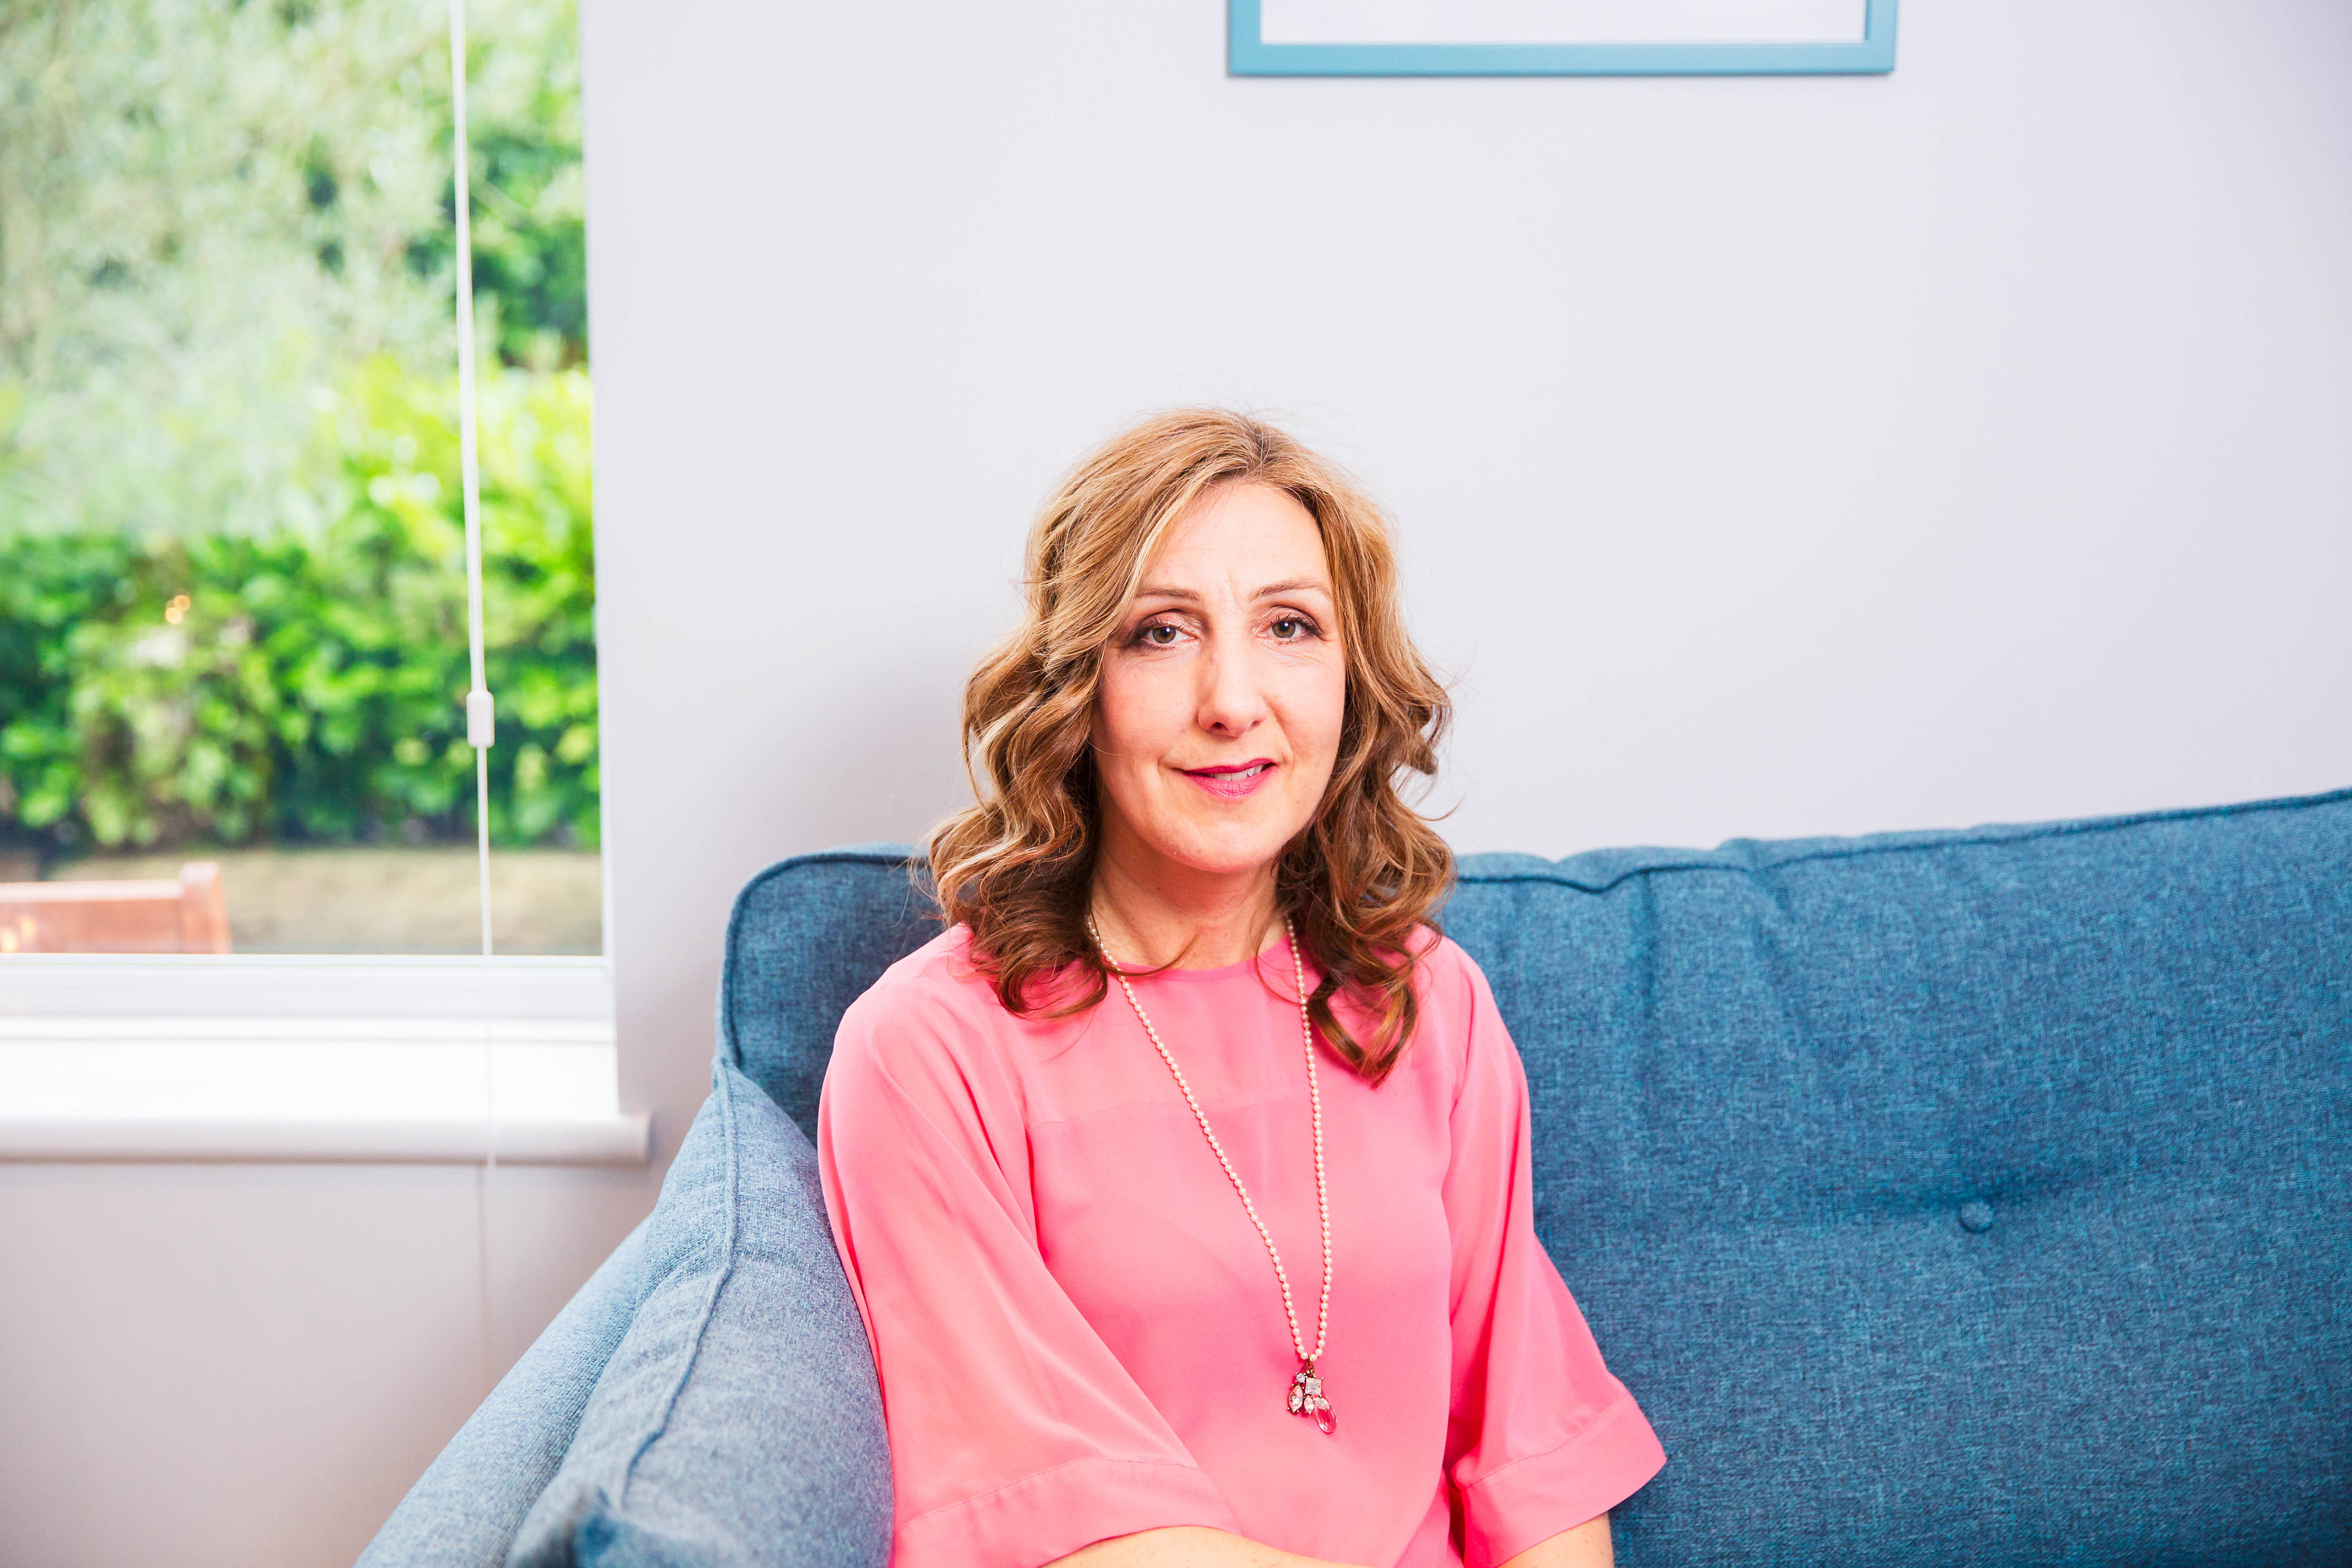 Meet Matchmaker Susie Lane